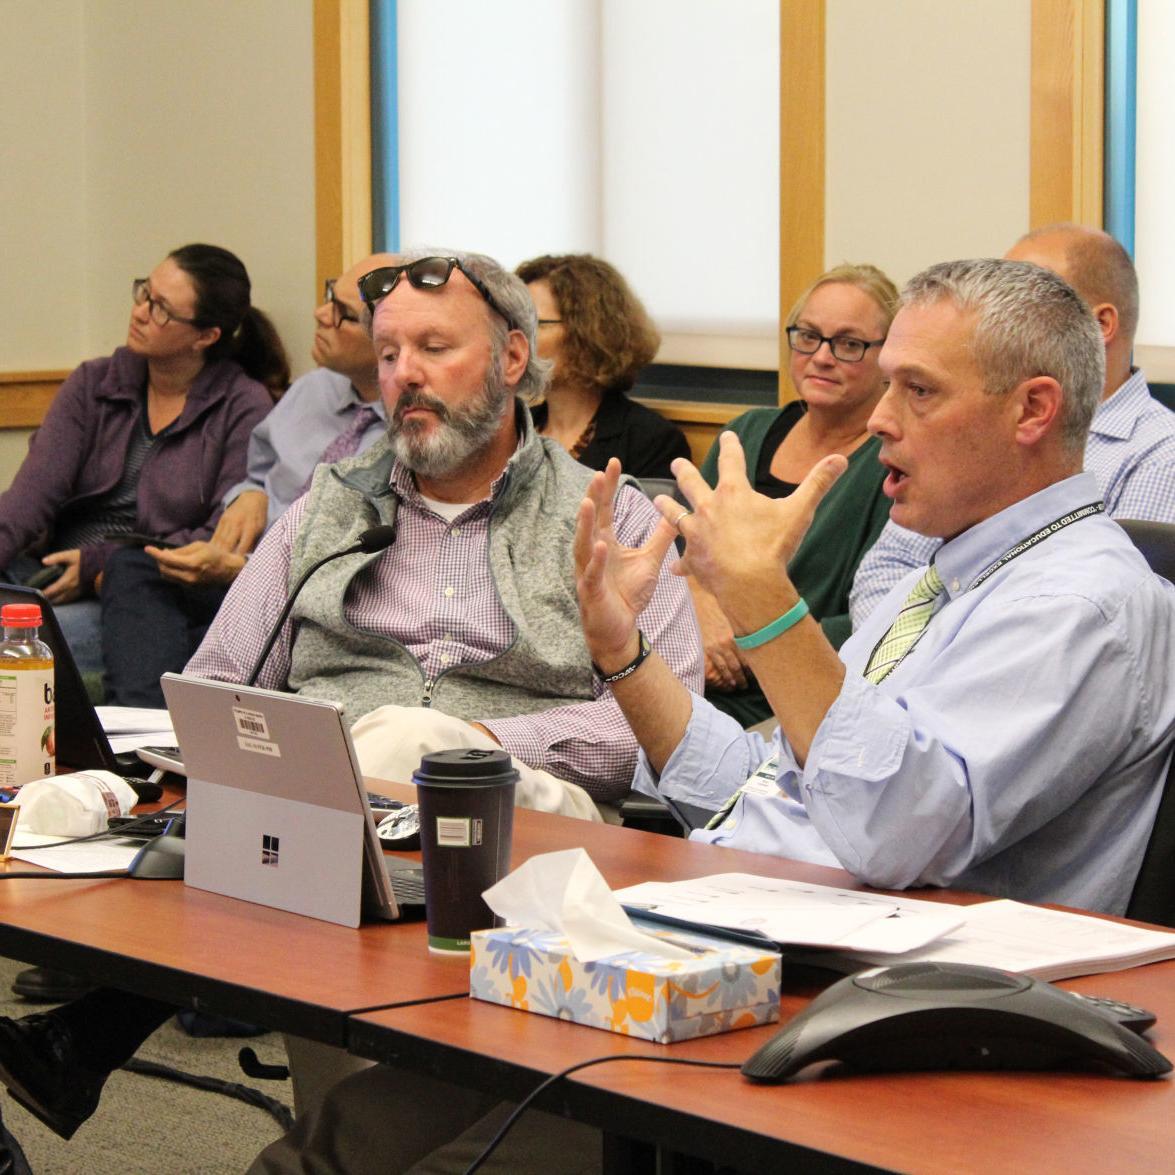 Public, Keene committee swap views on competency-based education